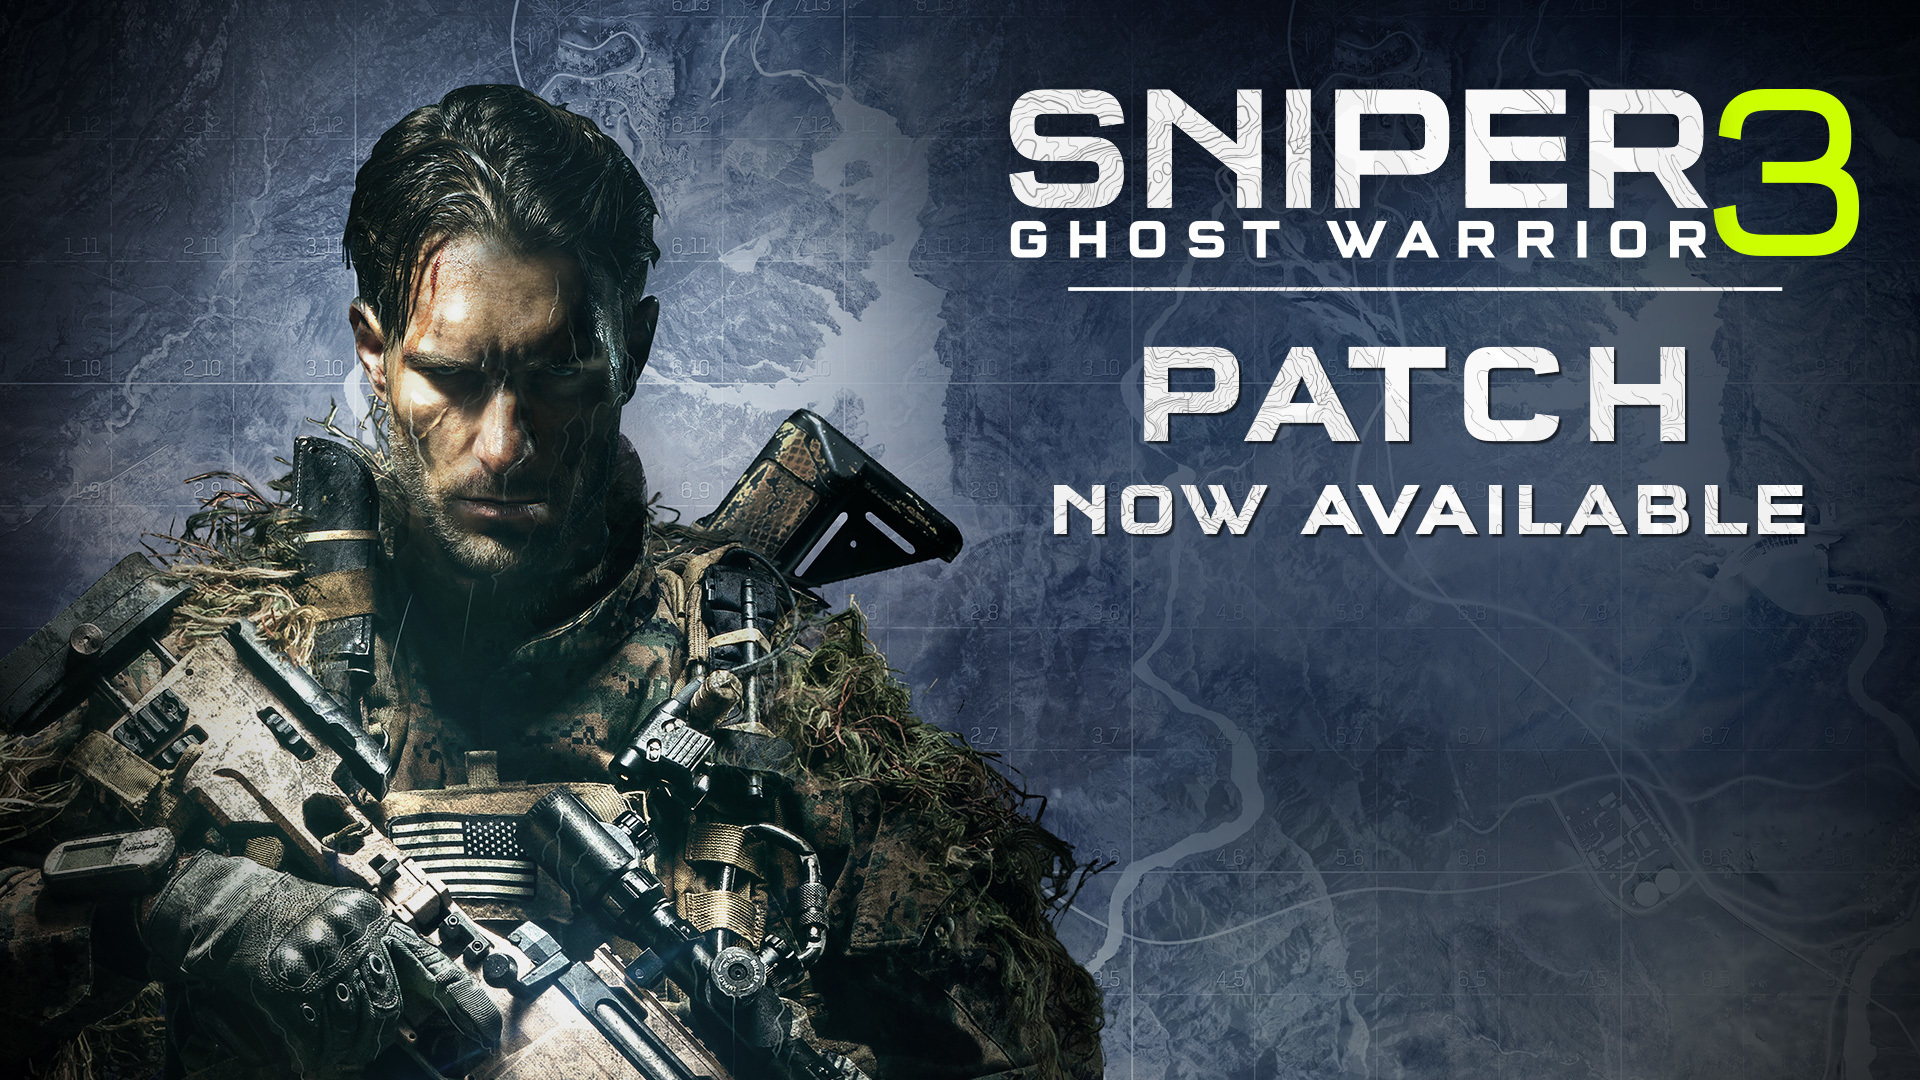 sniper ghost warrior 3 download for windows 10